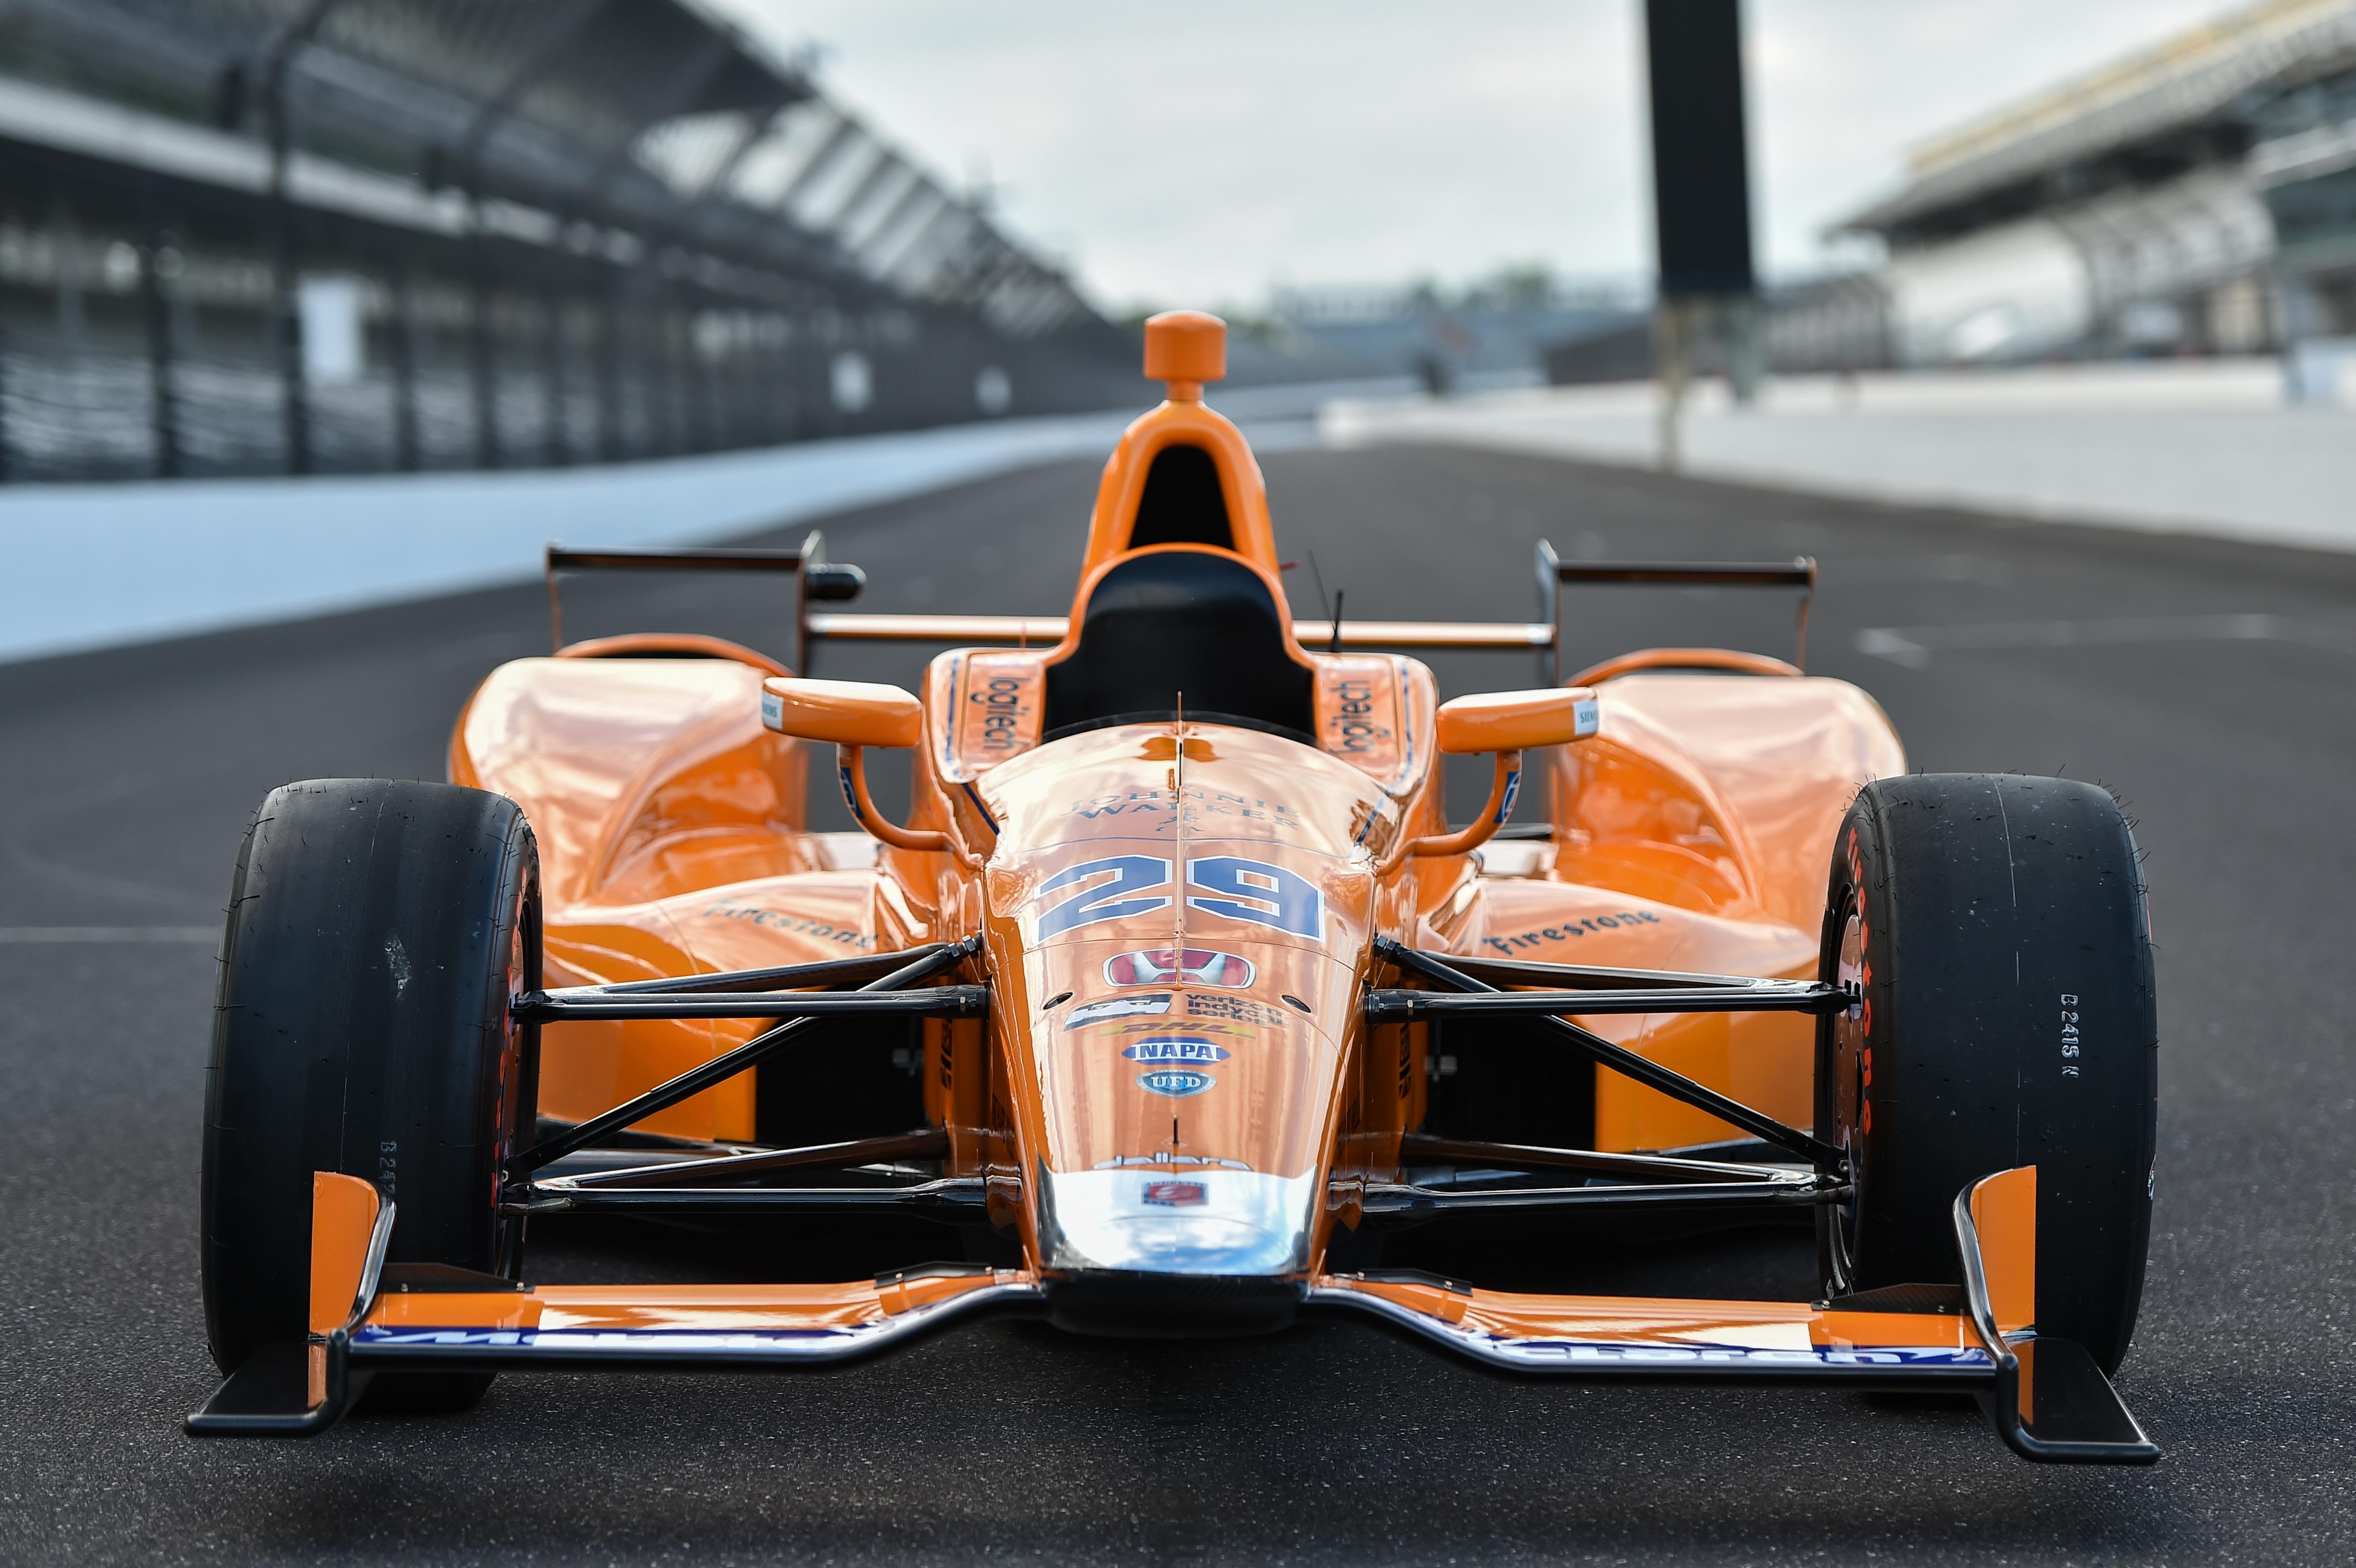 Fernando Alonso Indycar Test Video Racing News